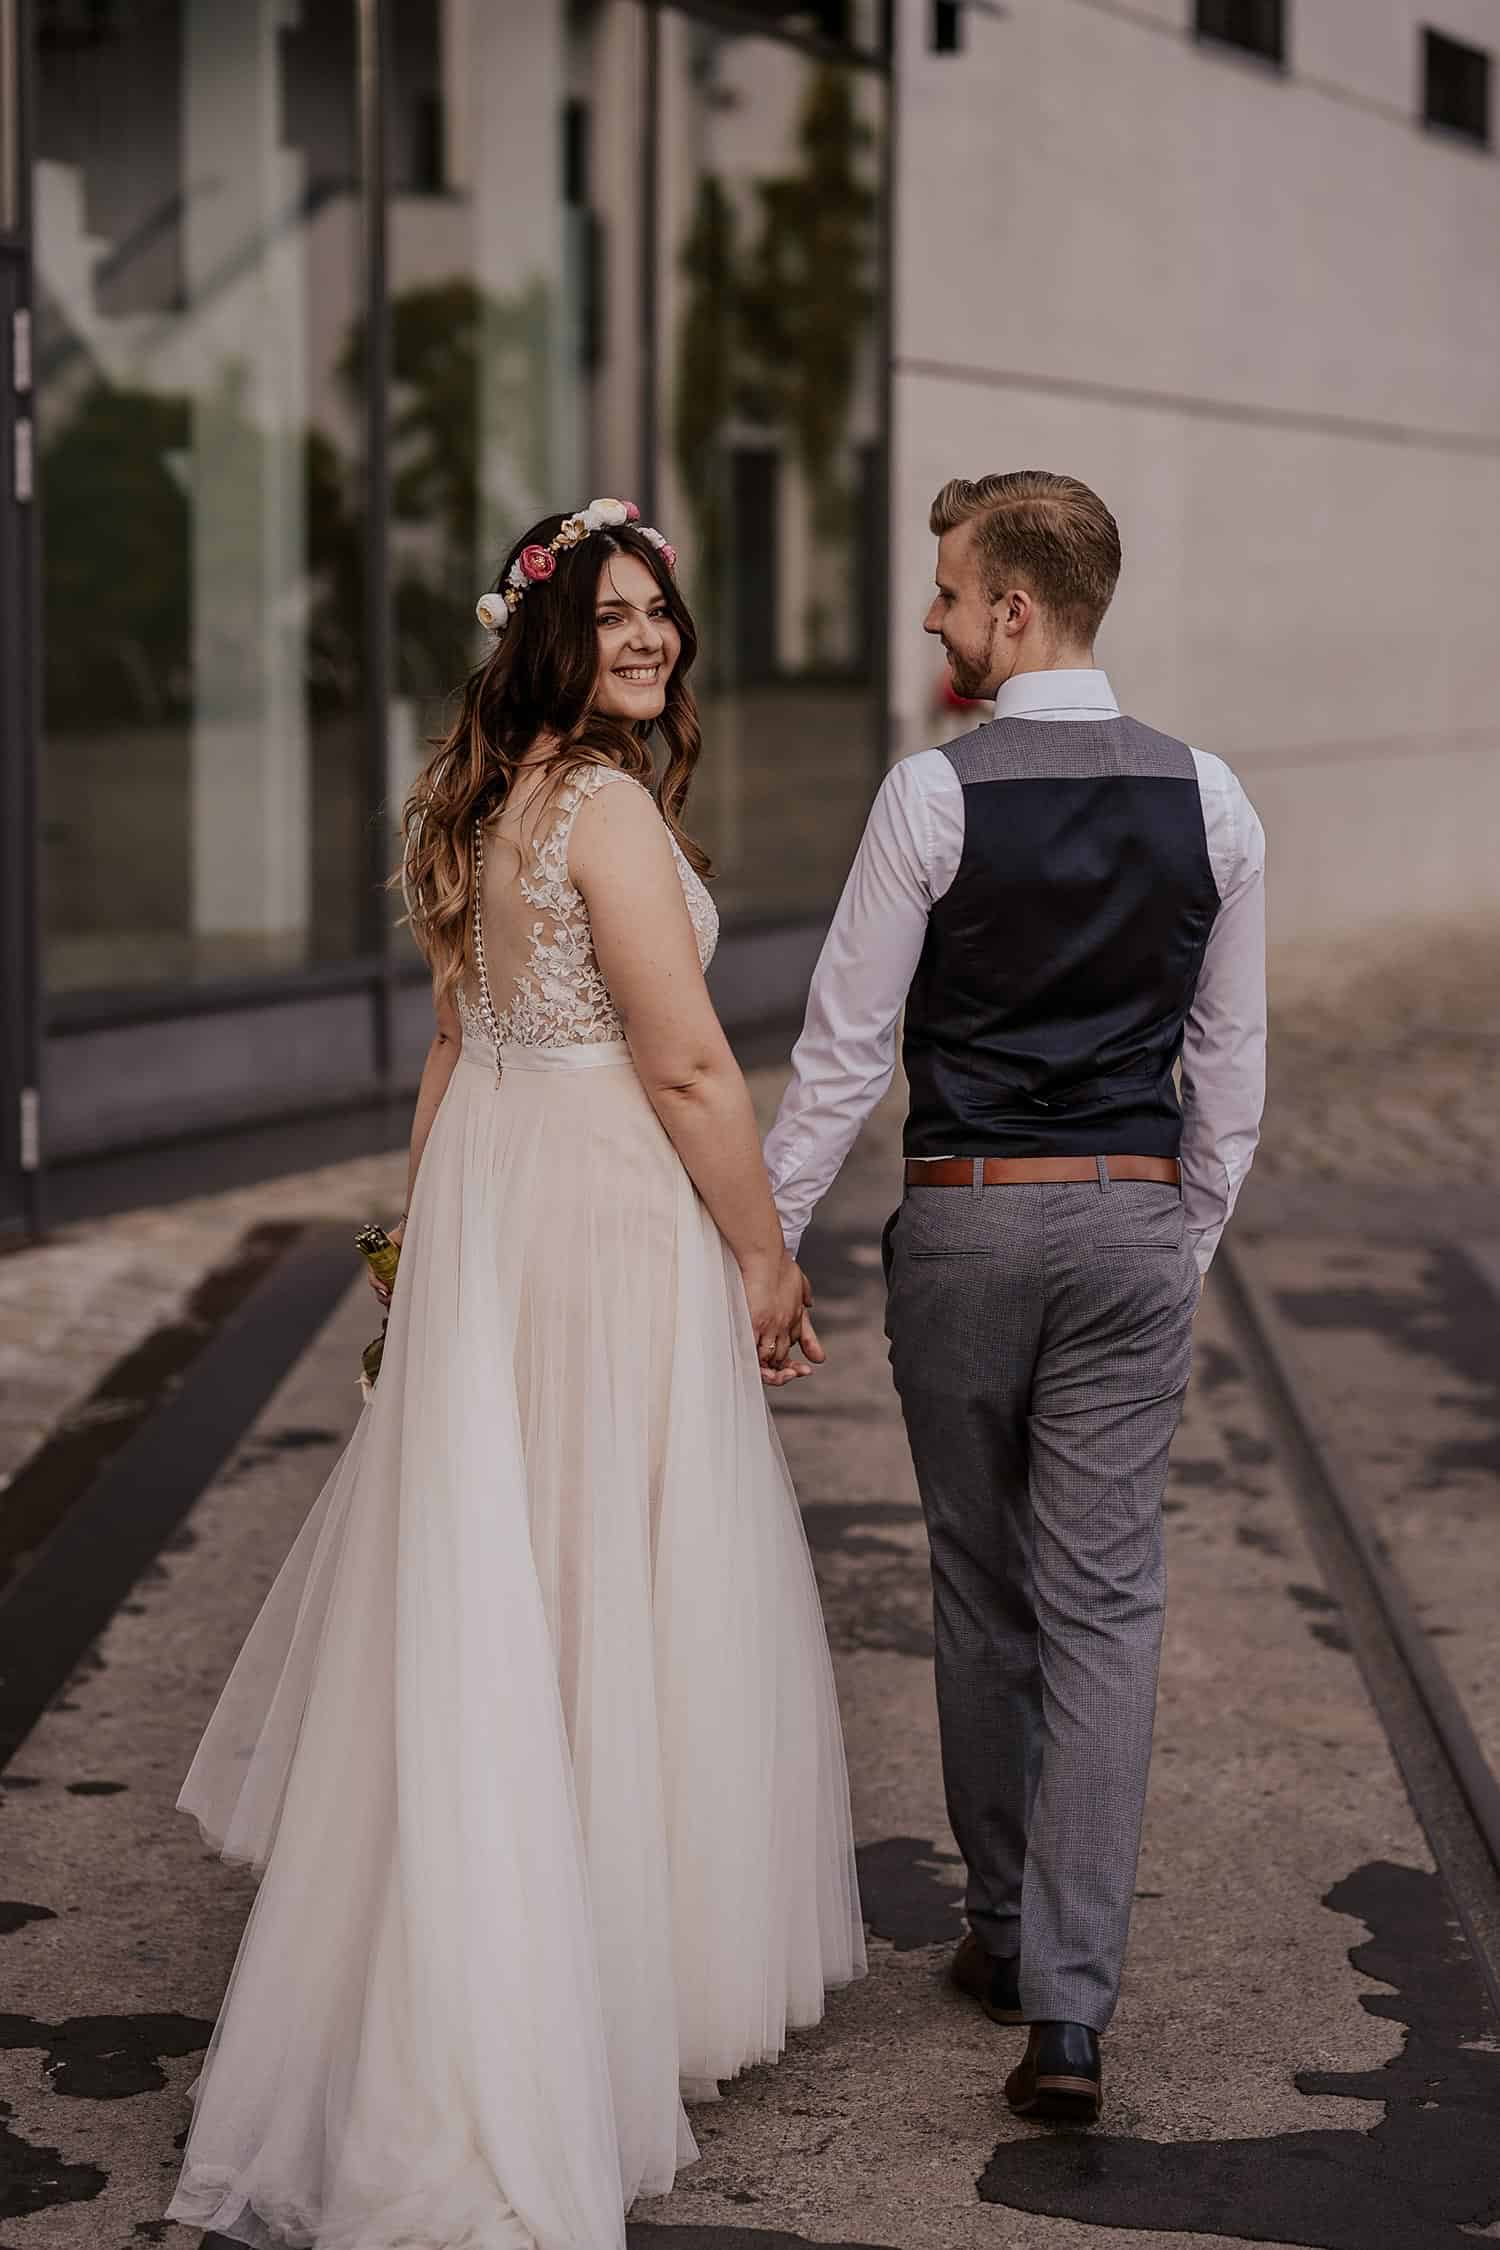 Hochzeit am Pier 13 Berlin - Hochzeitsfotograf Berlin Vasil Bituni